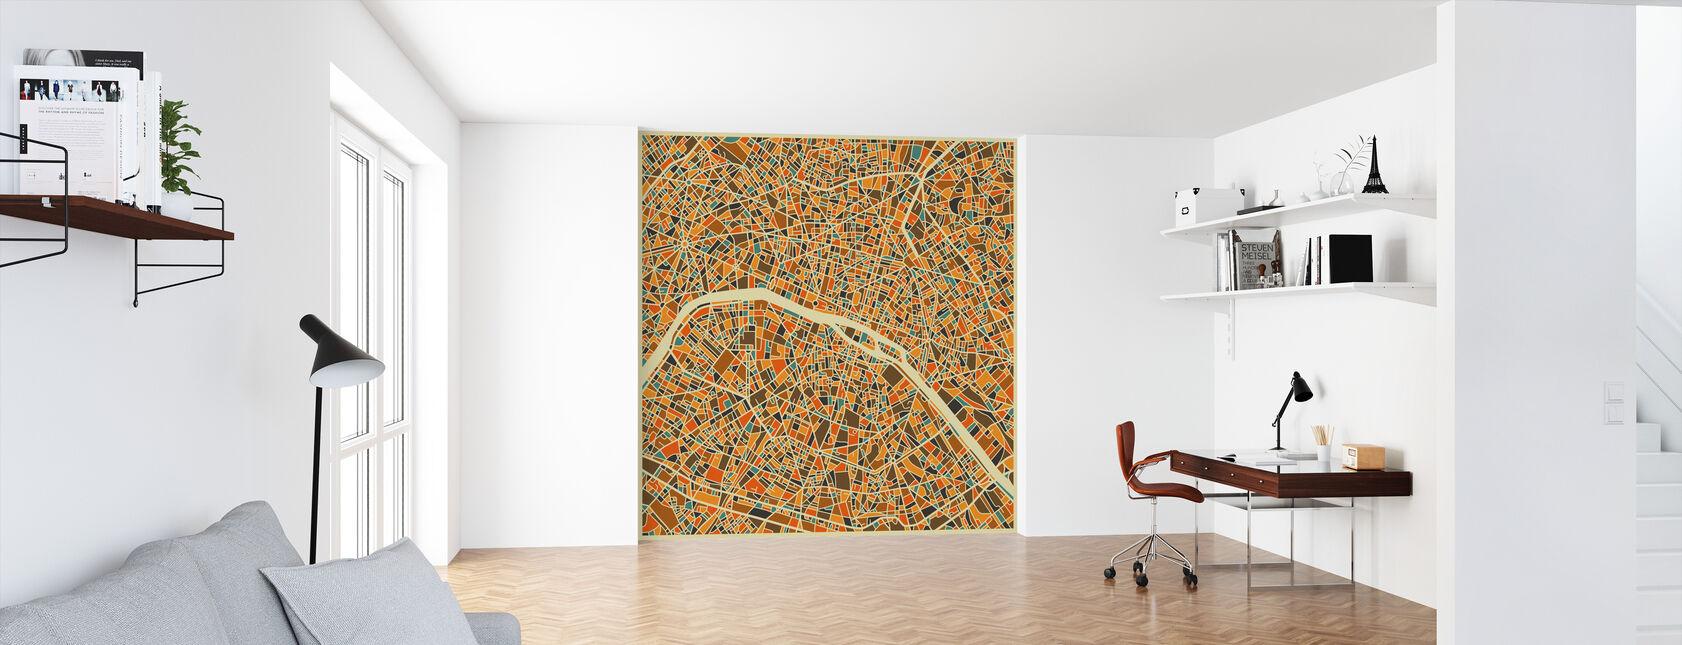 Multicolor Map - Paris - Wallpaper - Office